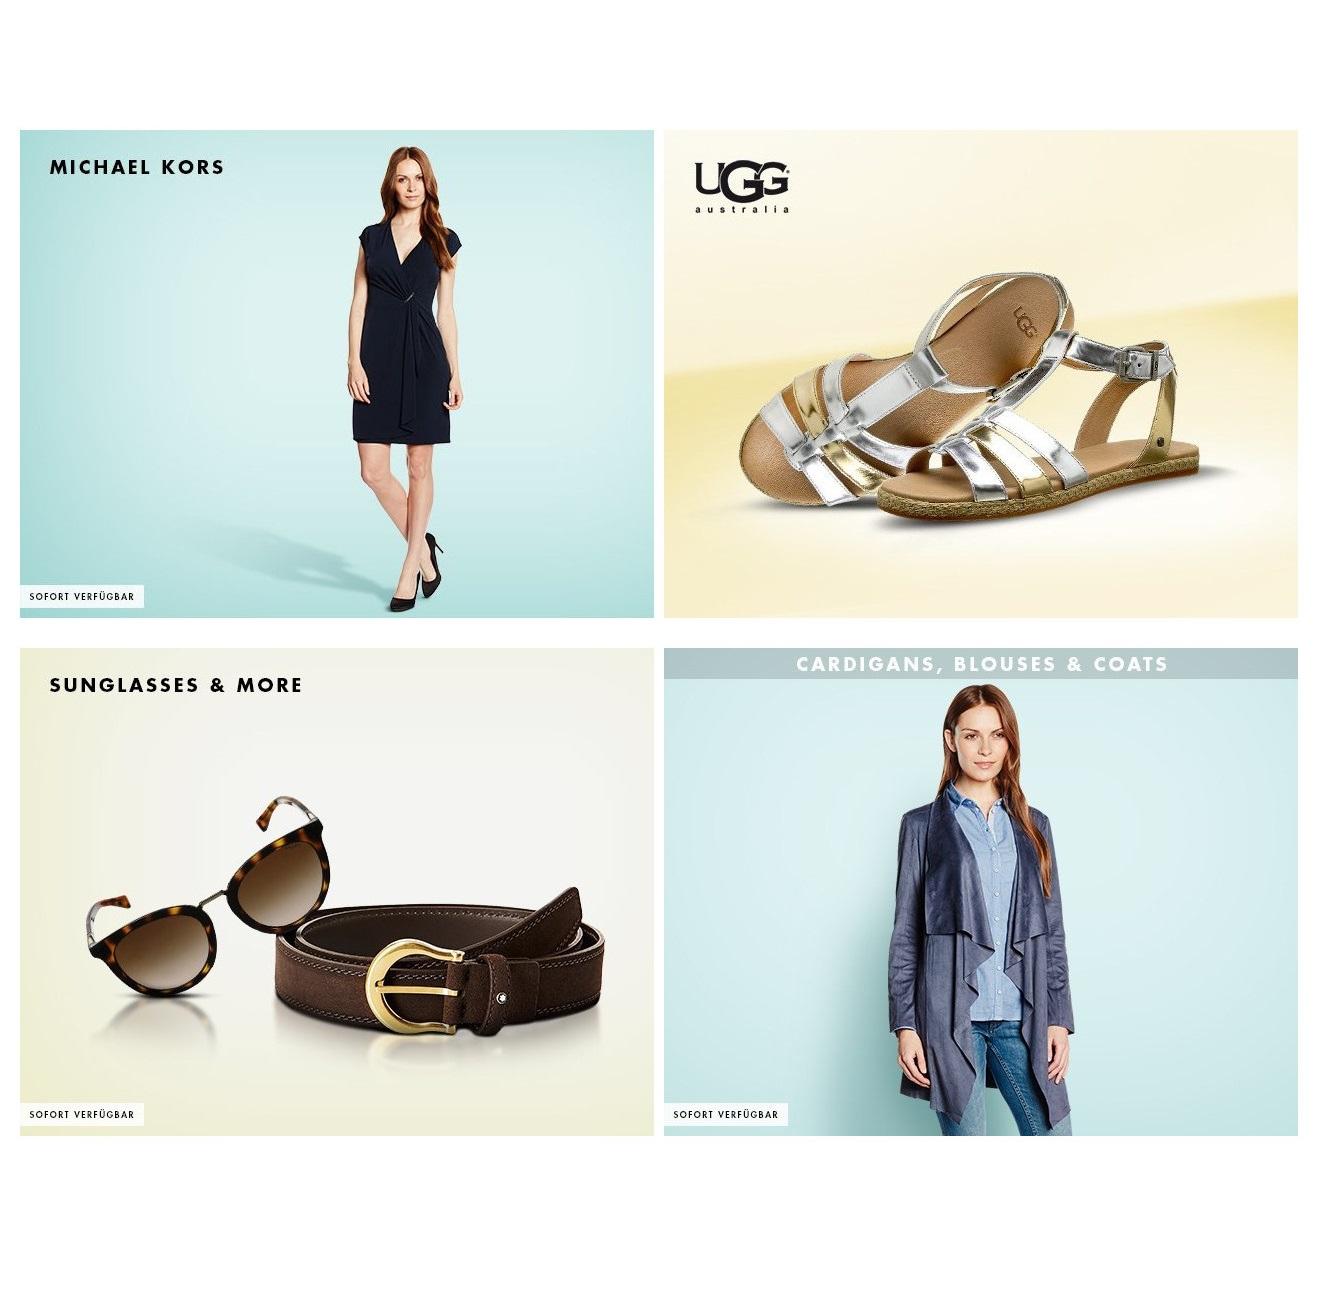 Michael Kors女装/Sunglass & More太阳镜及饰品/女装外套精选/UGG凉鞋